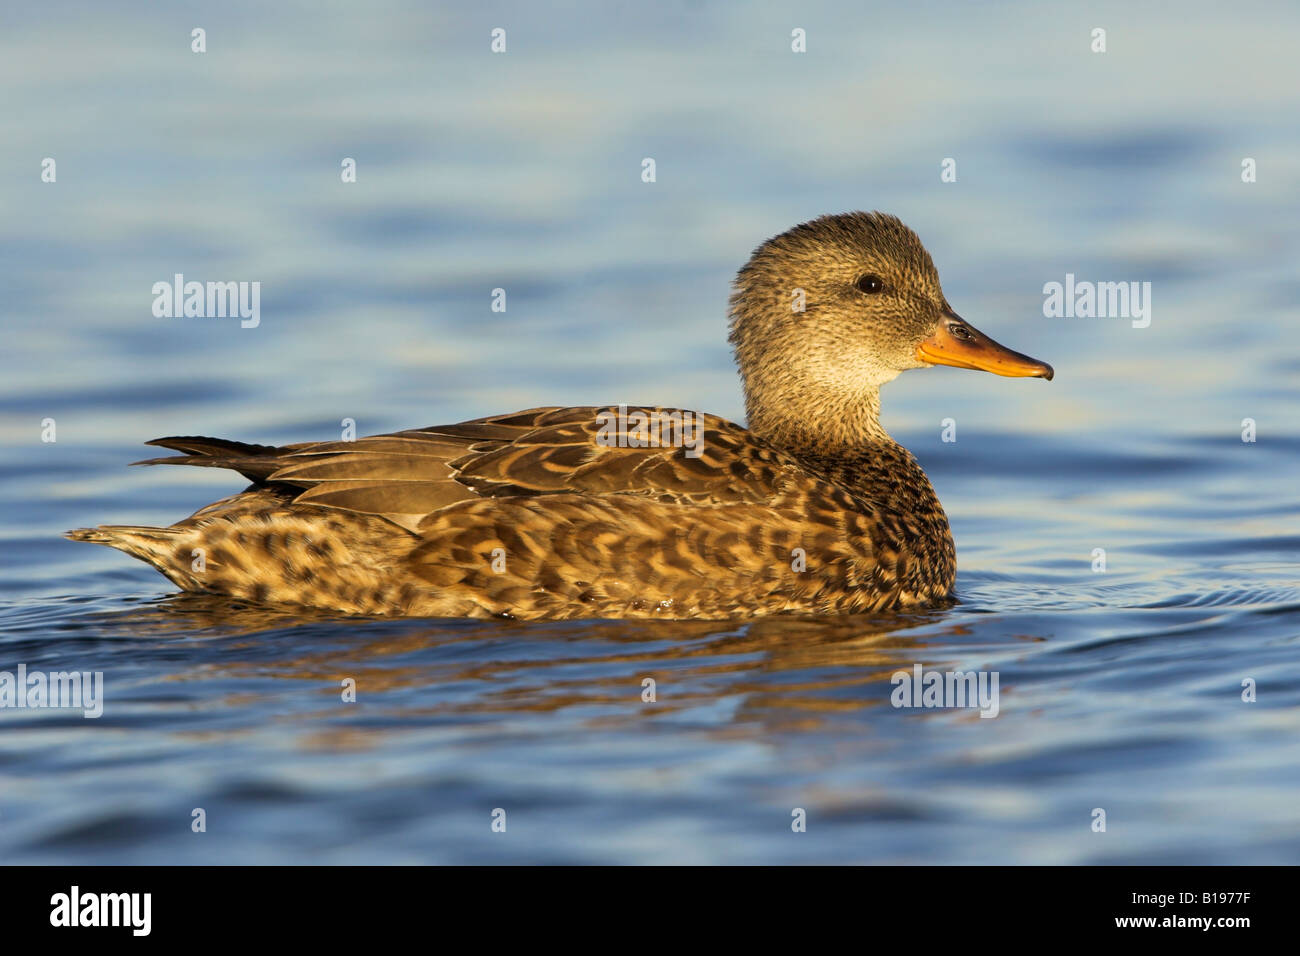 A Gadwall (Anas strepera) swimming in Lake Ontario in Etobicoke, Ontario Canada. - Stock Image